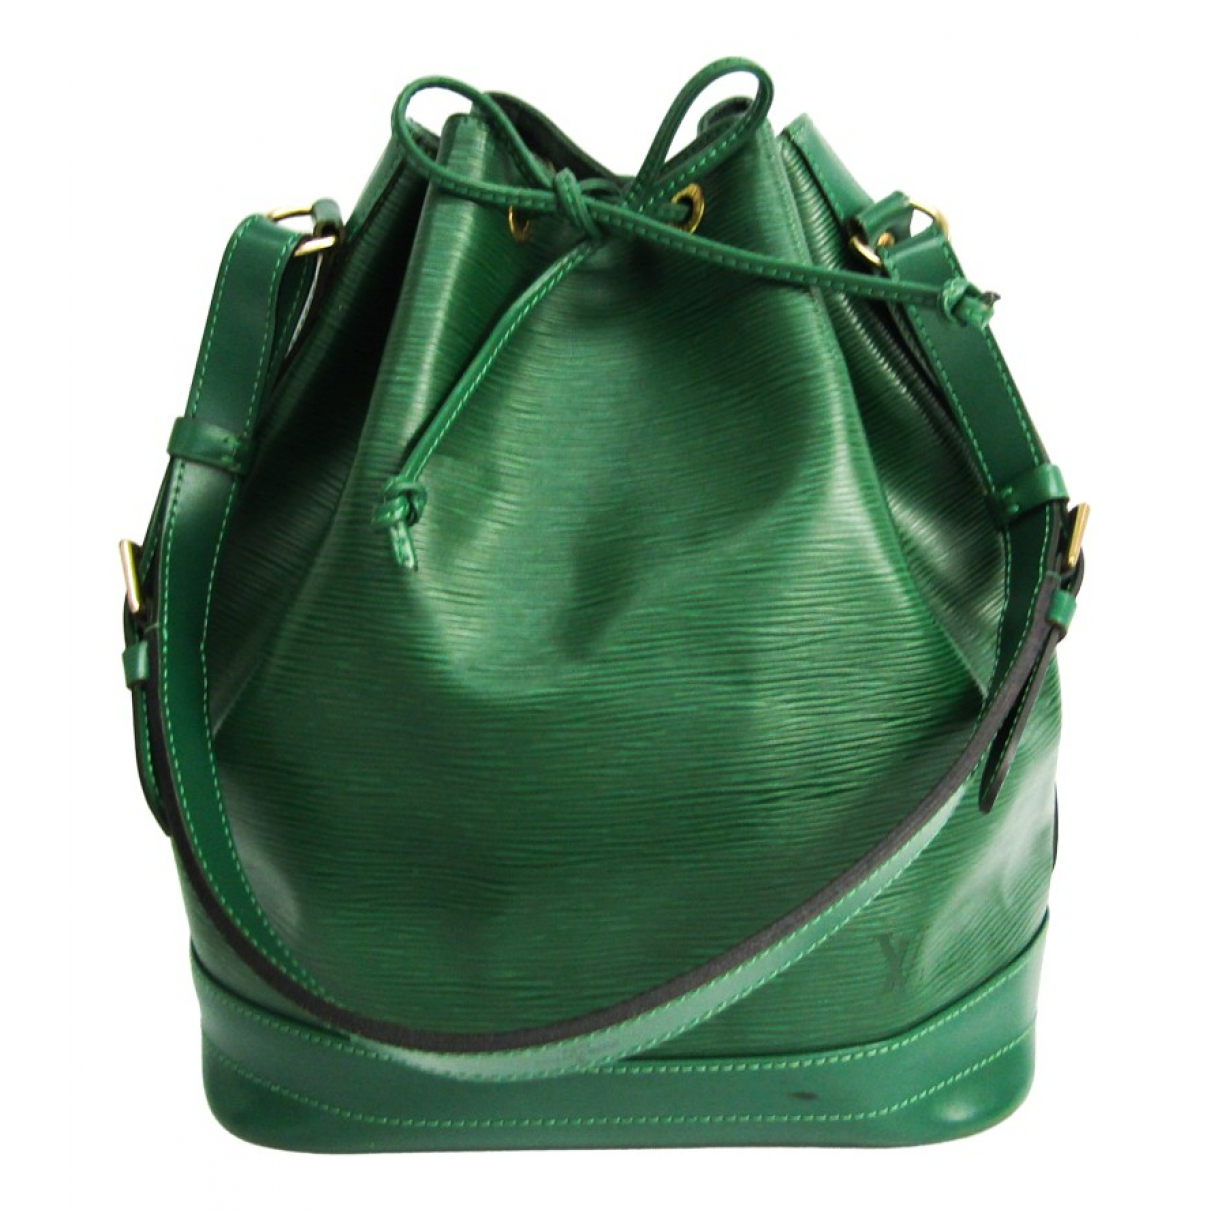 Louis Vuitton Noé Green Leather handbag for Women \N